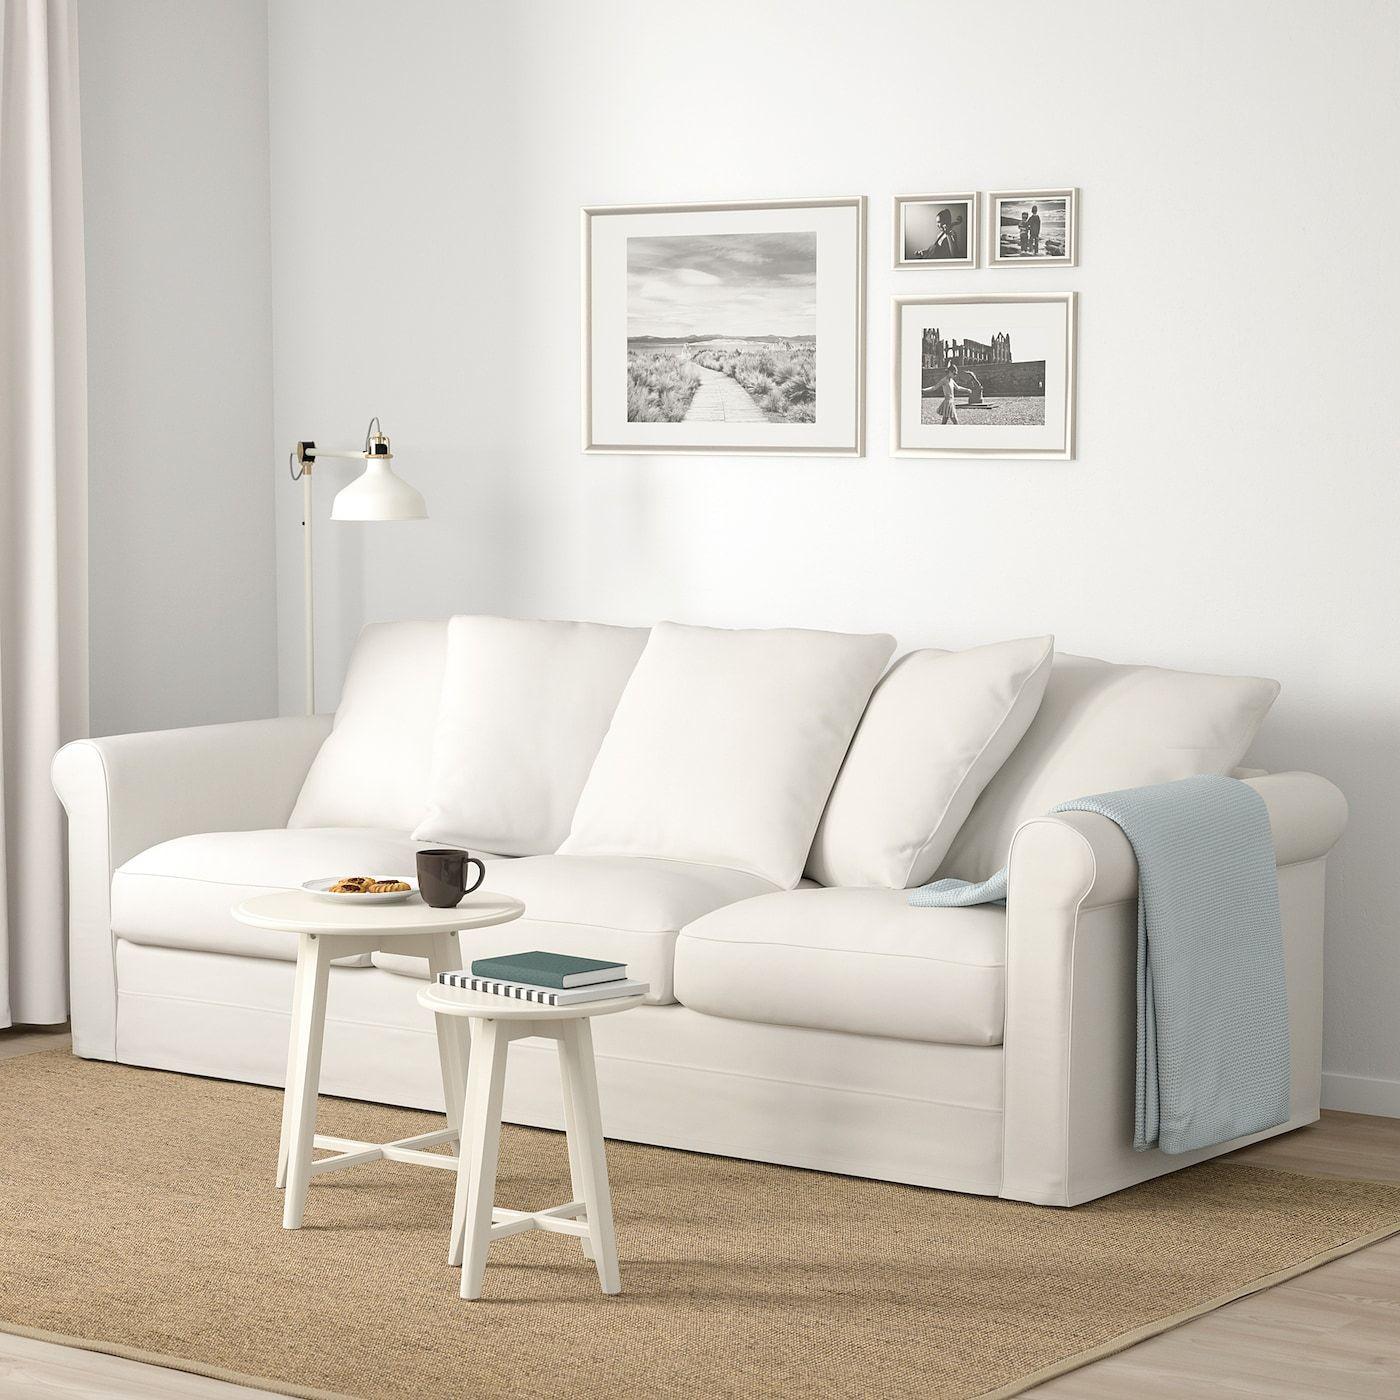 Gronlid 3er Sofa Inseros Weiss Ikea Osterreich 3er Sofa Sofa 2er Sofa